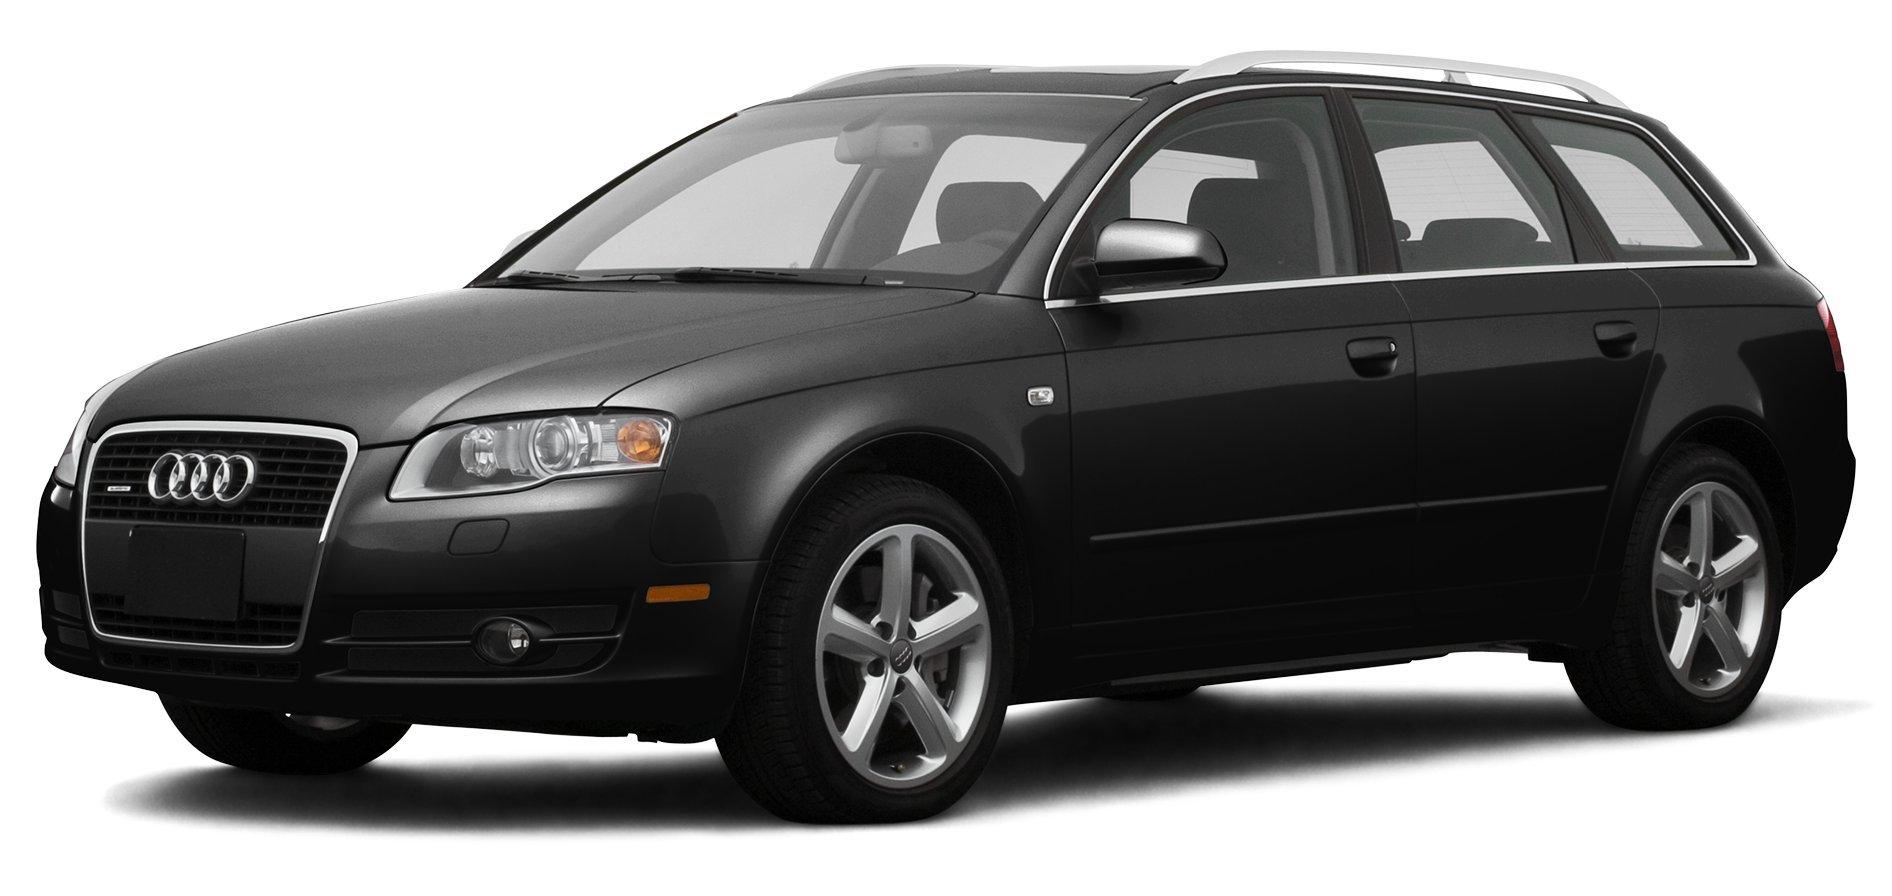 ... 2007 Audi A4 Quattro 3.2L, 2007 5-Door Wagon Automatic Transmission quattro ...